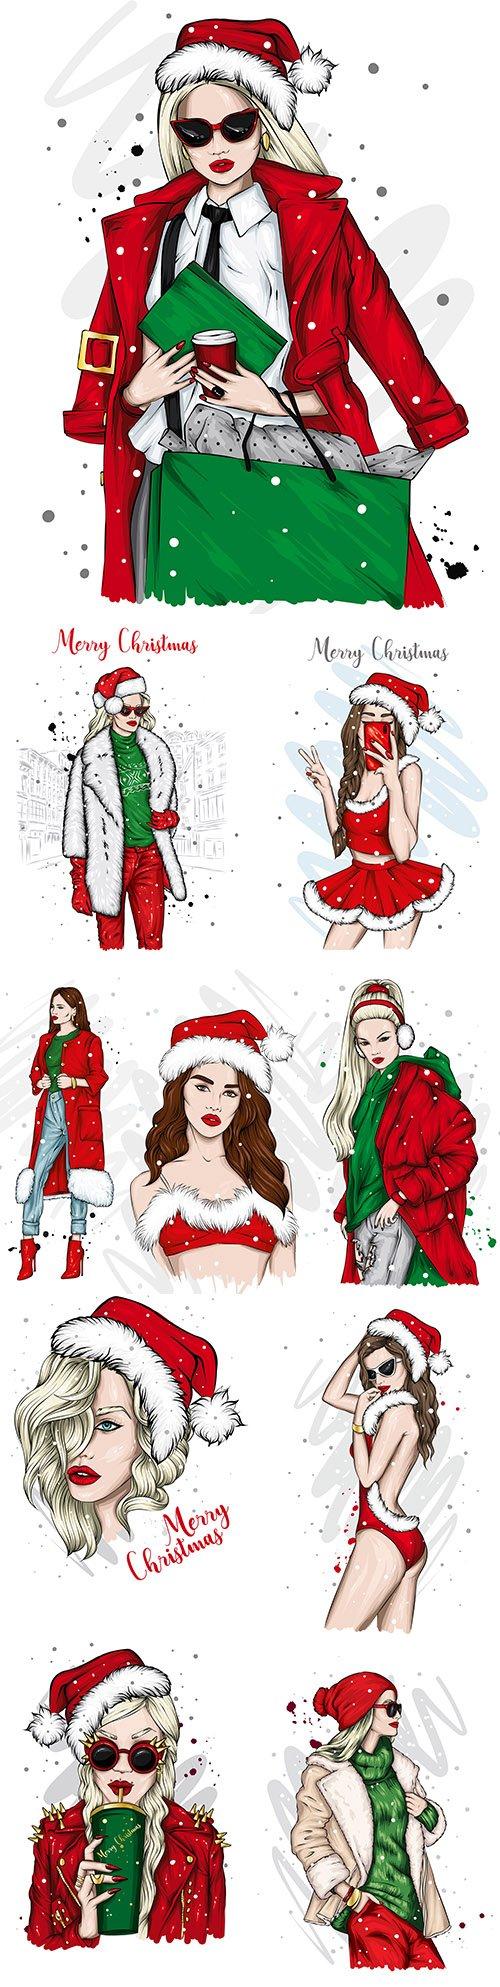 The beautiful girl in Santa's hat Christmas illustrations